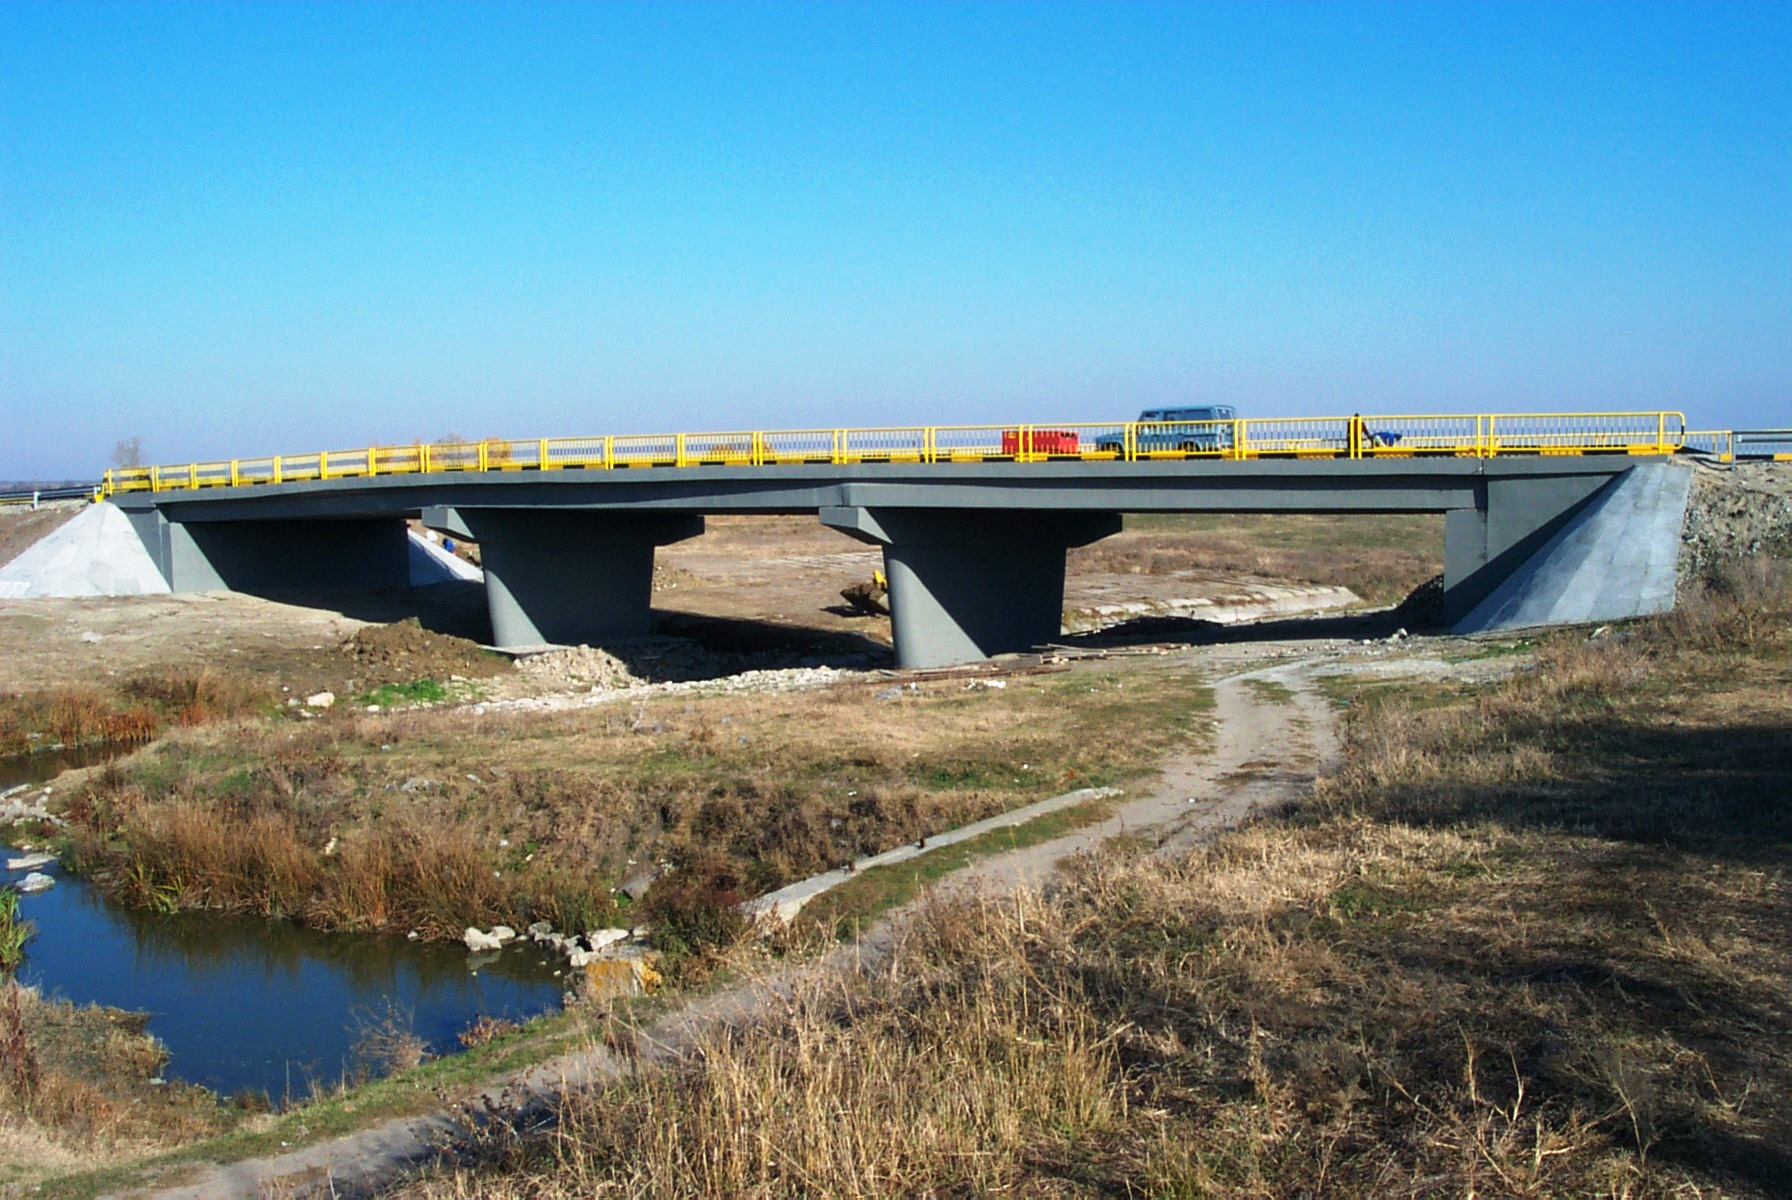 Reparatii pod (DN2), Km. 33 - 028, peste raul Calnistea MAPEI - Poza 117